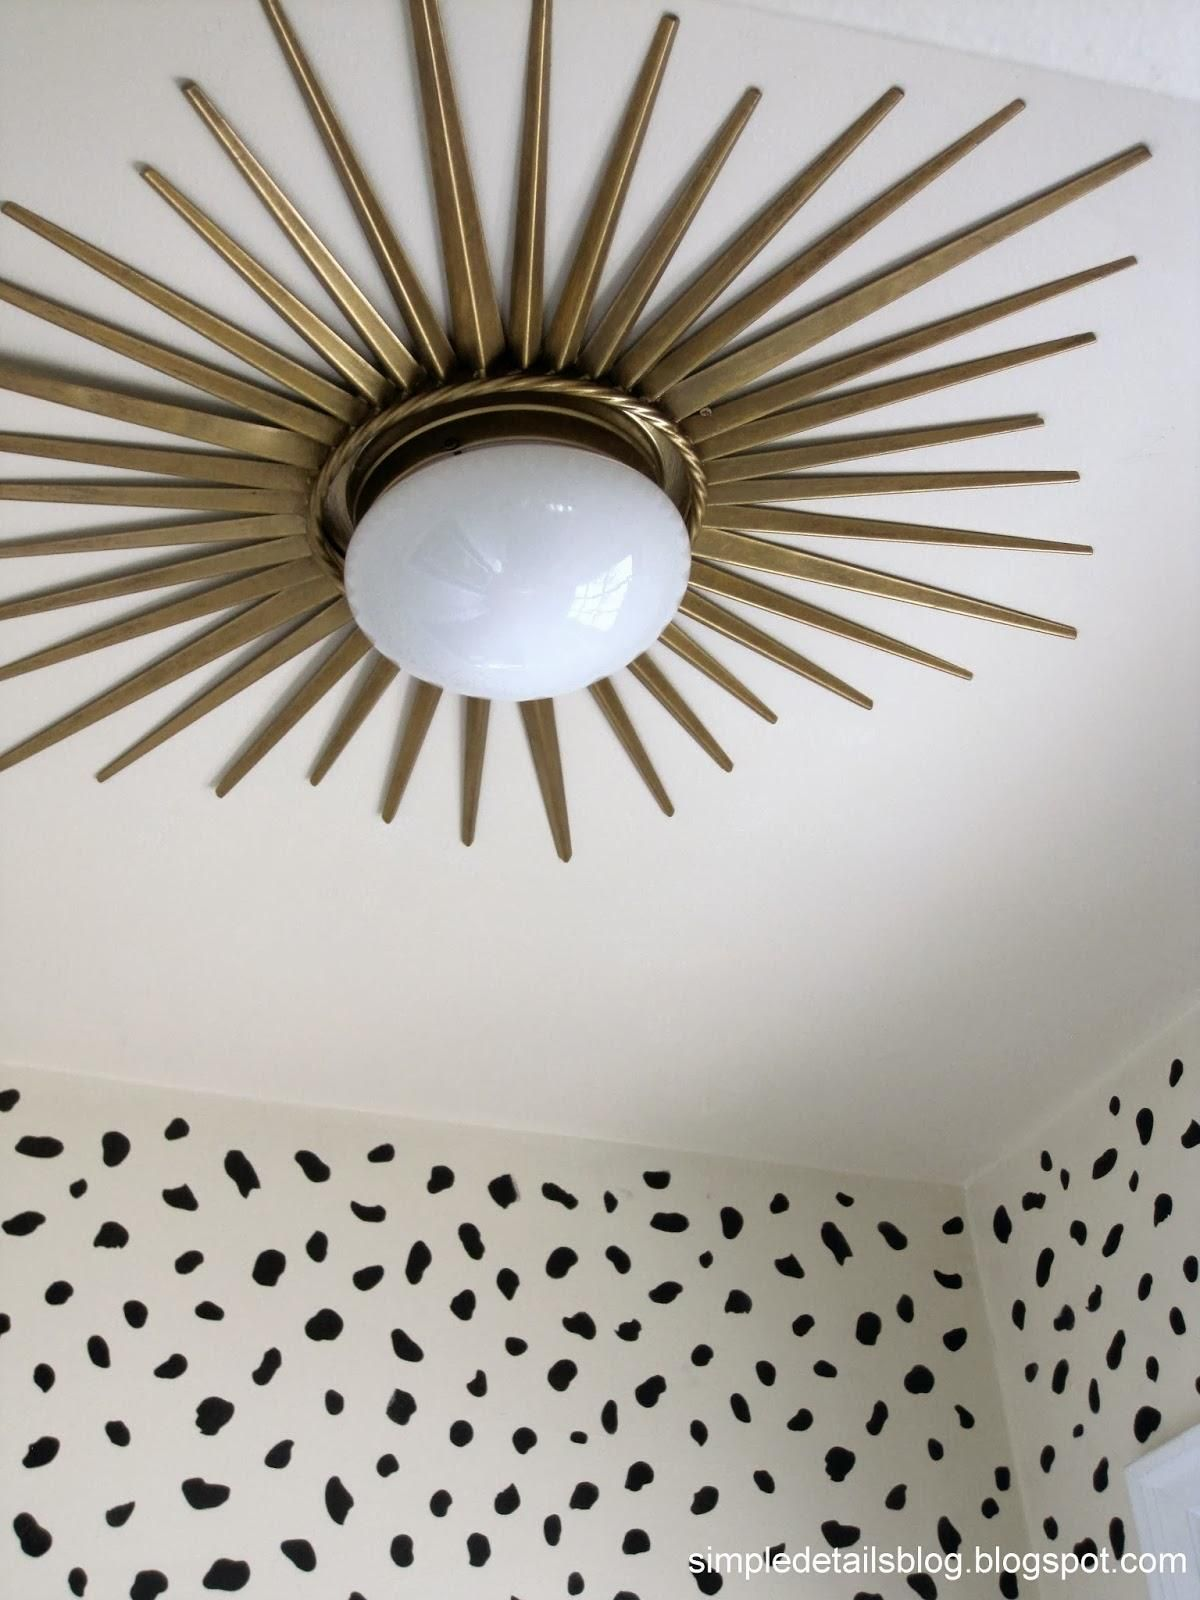 This gorgeous sunburst ceiling light was created using a hampton bay